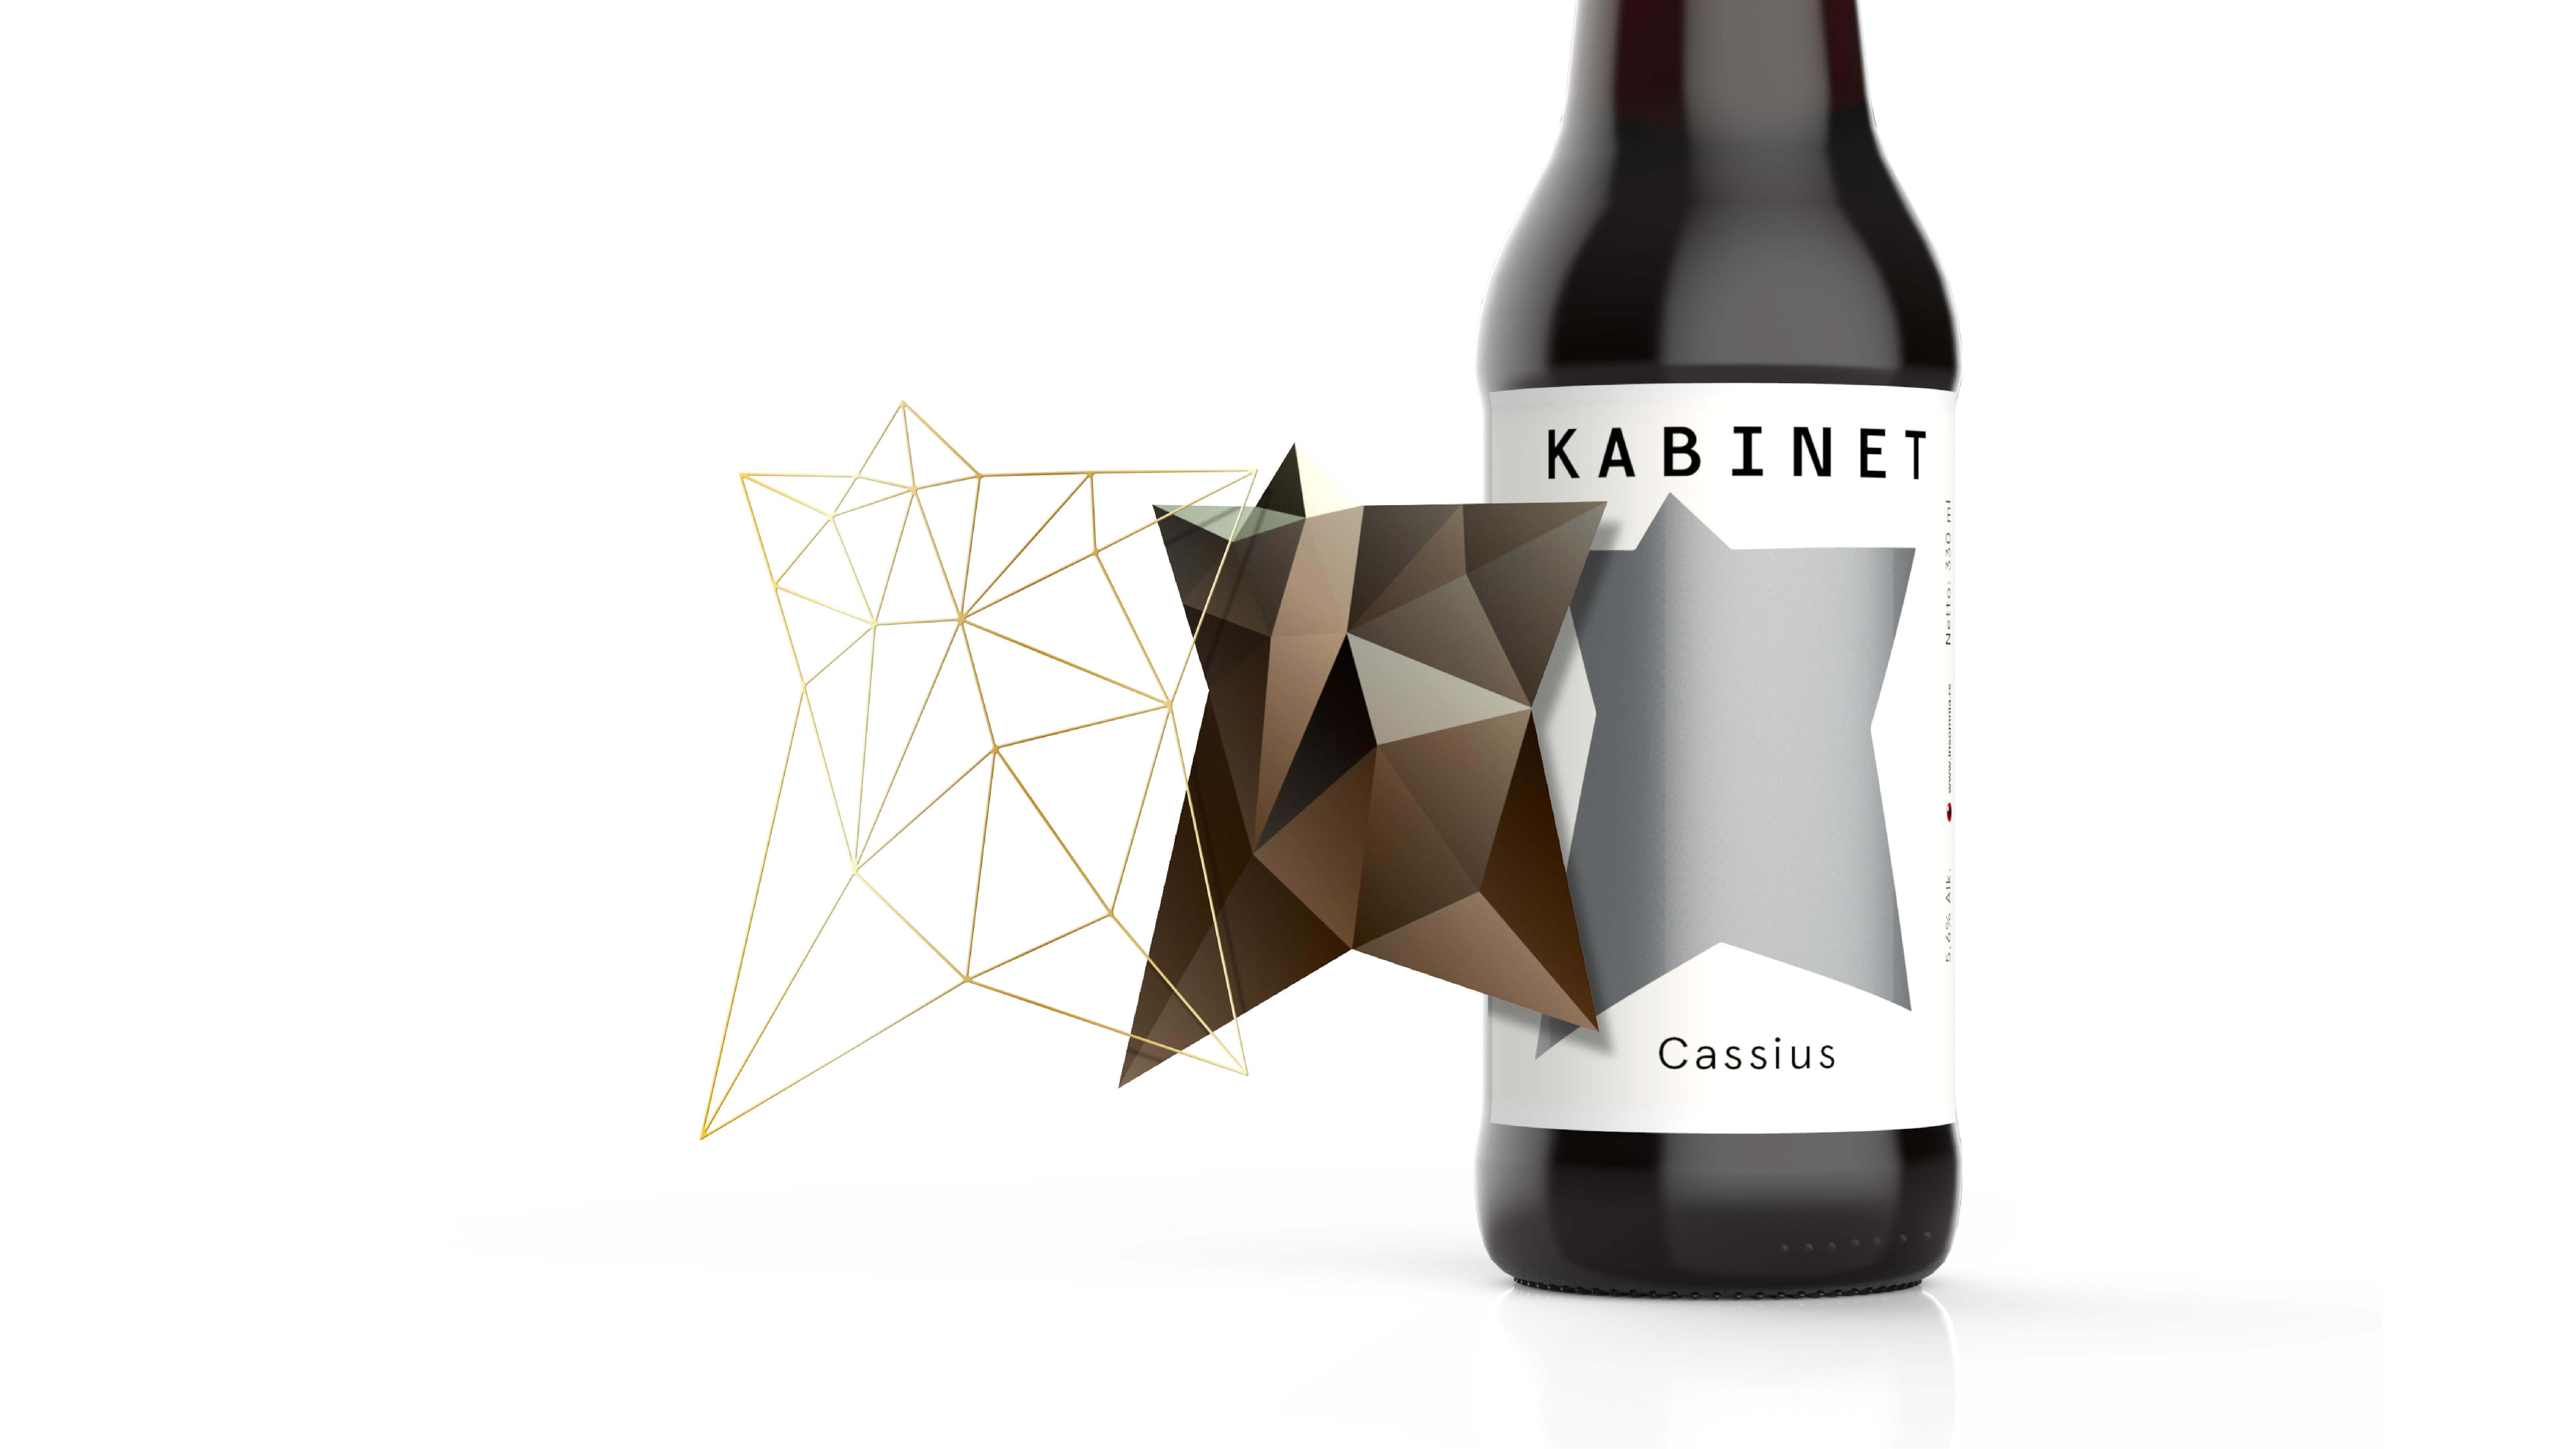 kabinet_1920x1080-05